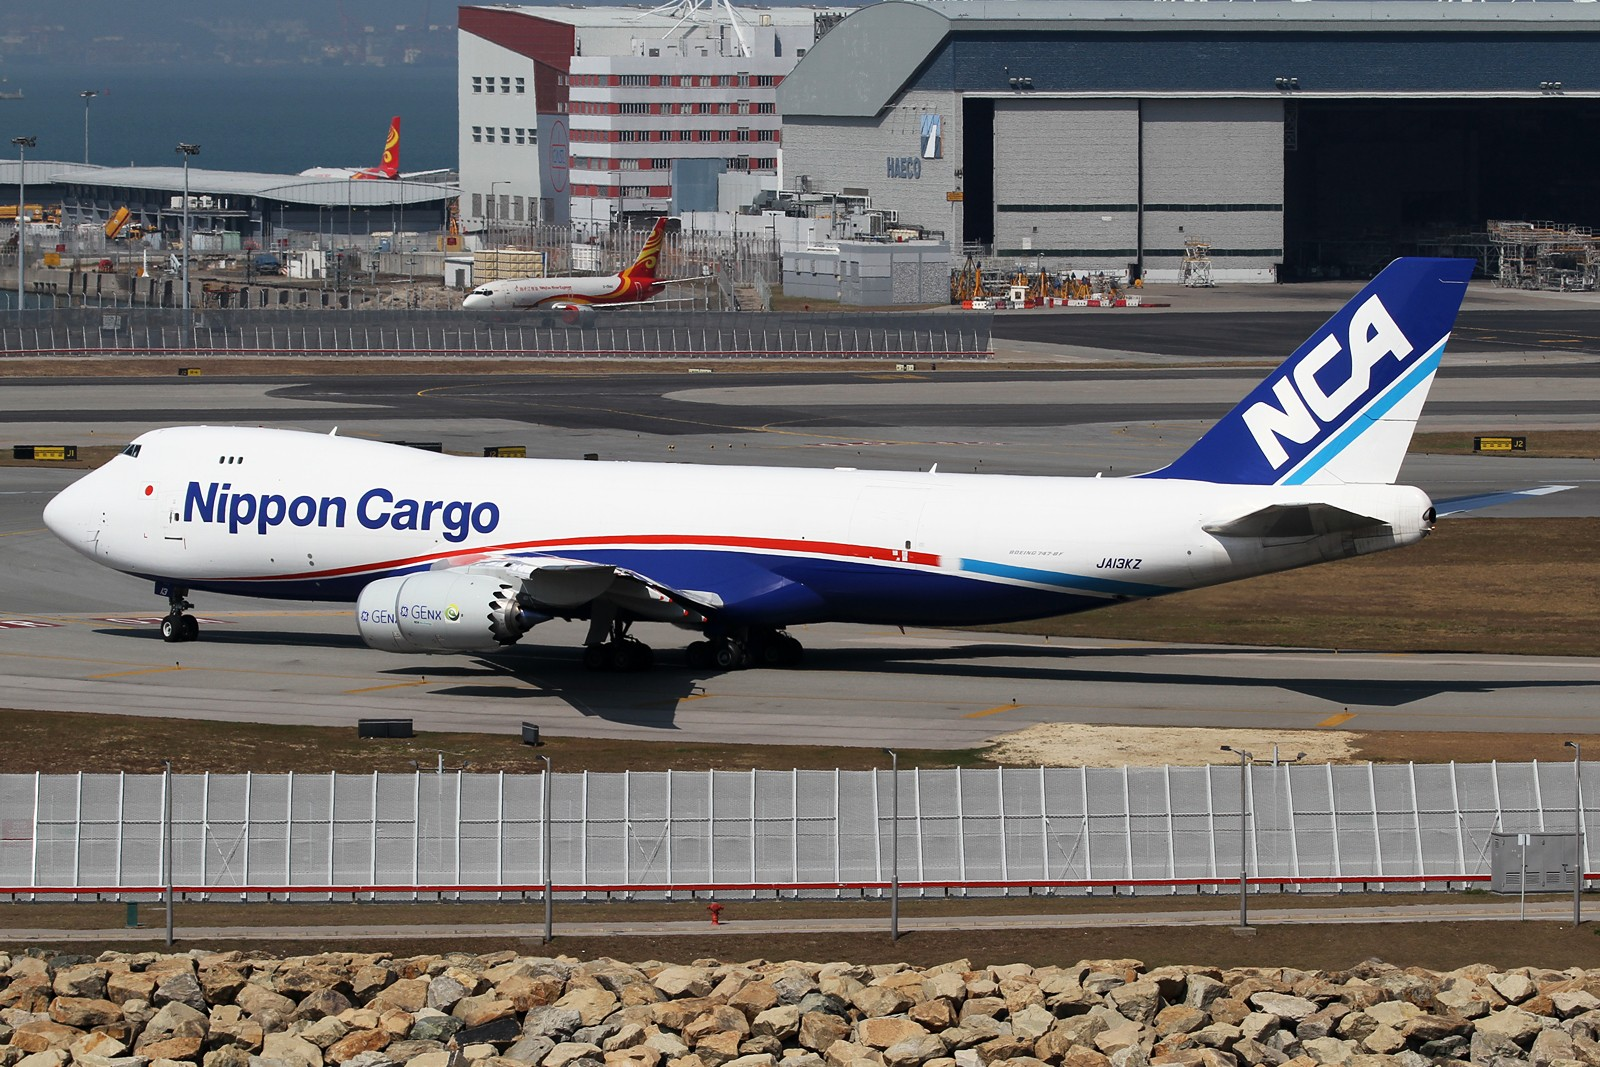 【HKG】**********HKG第二次流窜归来,比较有代表性的3pics********** BOEING 747-8KZF/SCD JA13KZ 中国香港赤鱲角国际机场